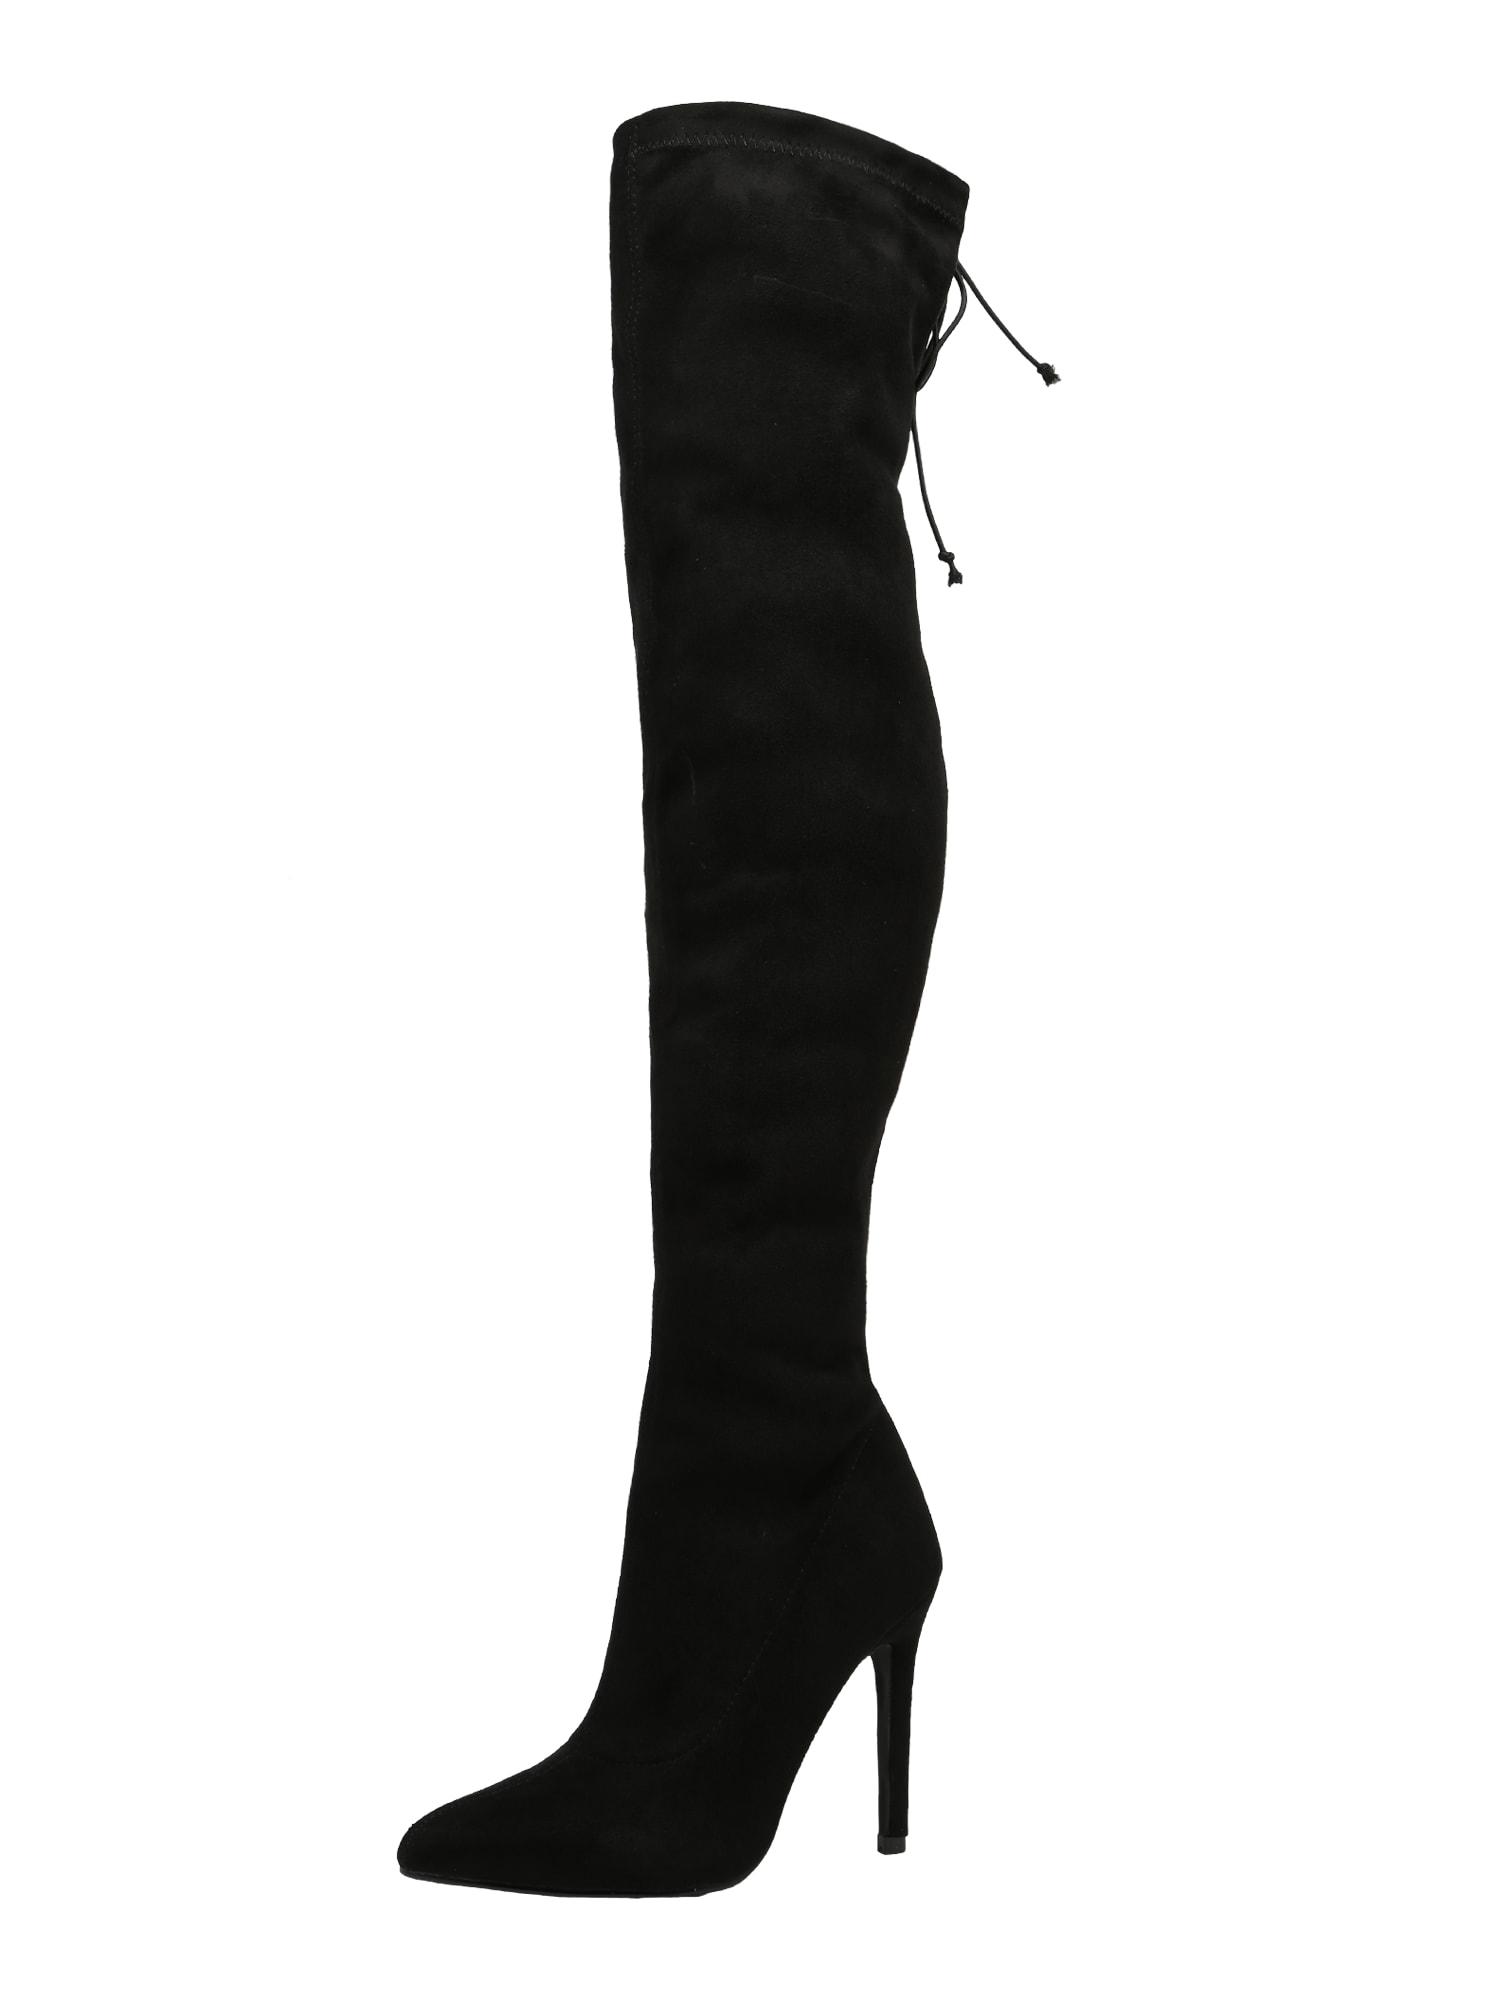 4th & Reckless, Dames Overknee laarzen 'MOLLY', zwart